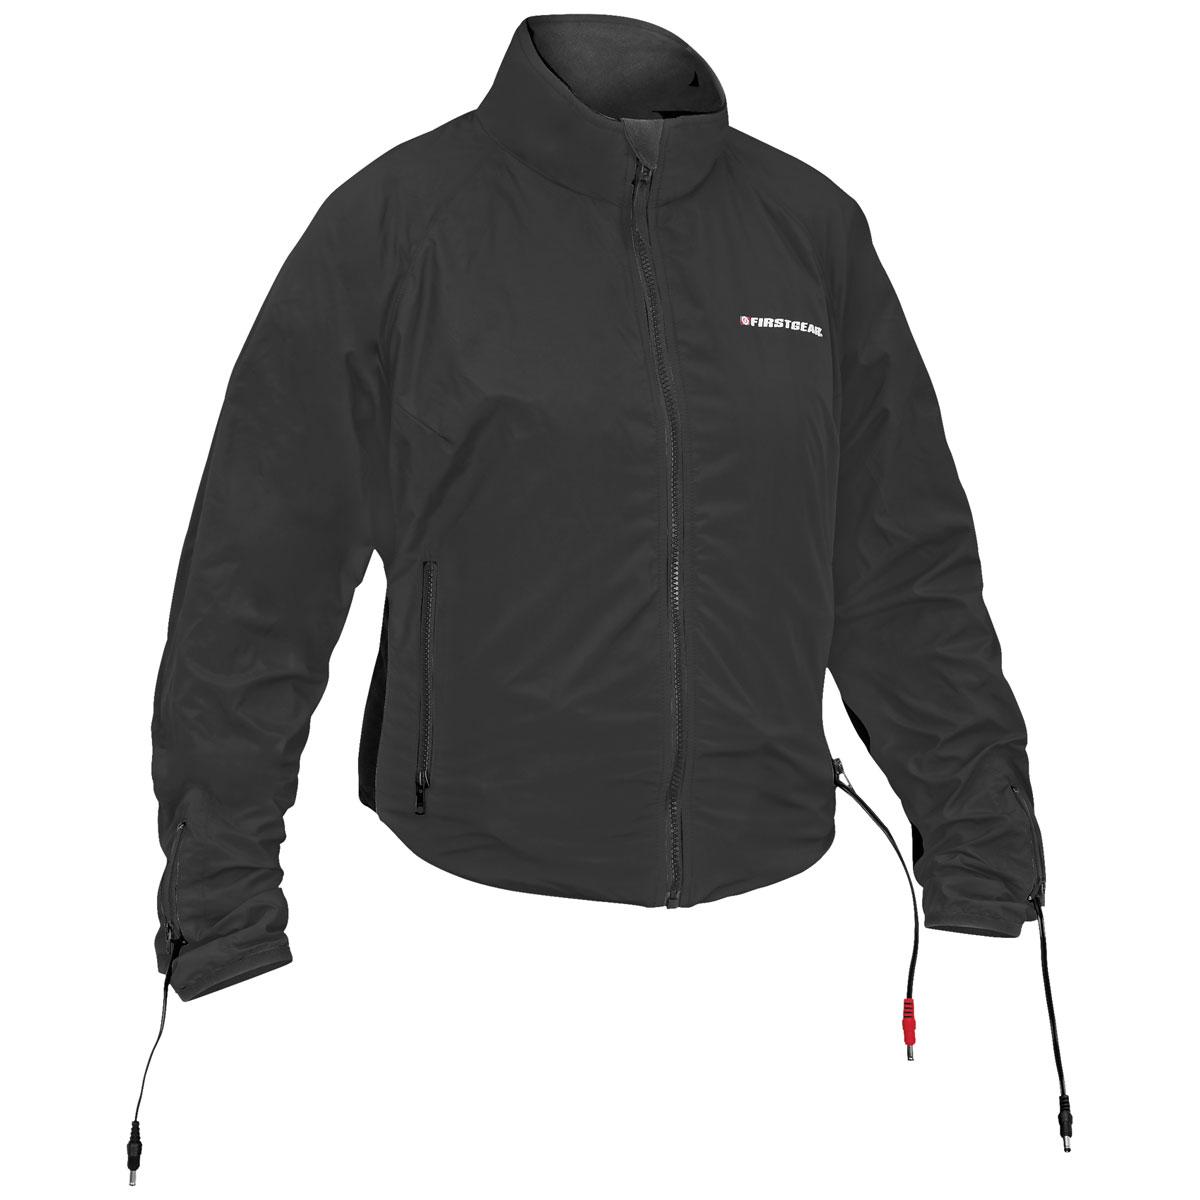 Firstgear Women's 90-Watt Heated Black Jacket Liner